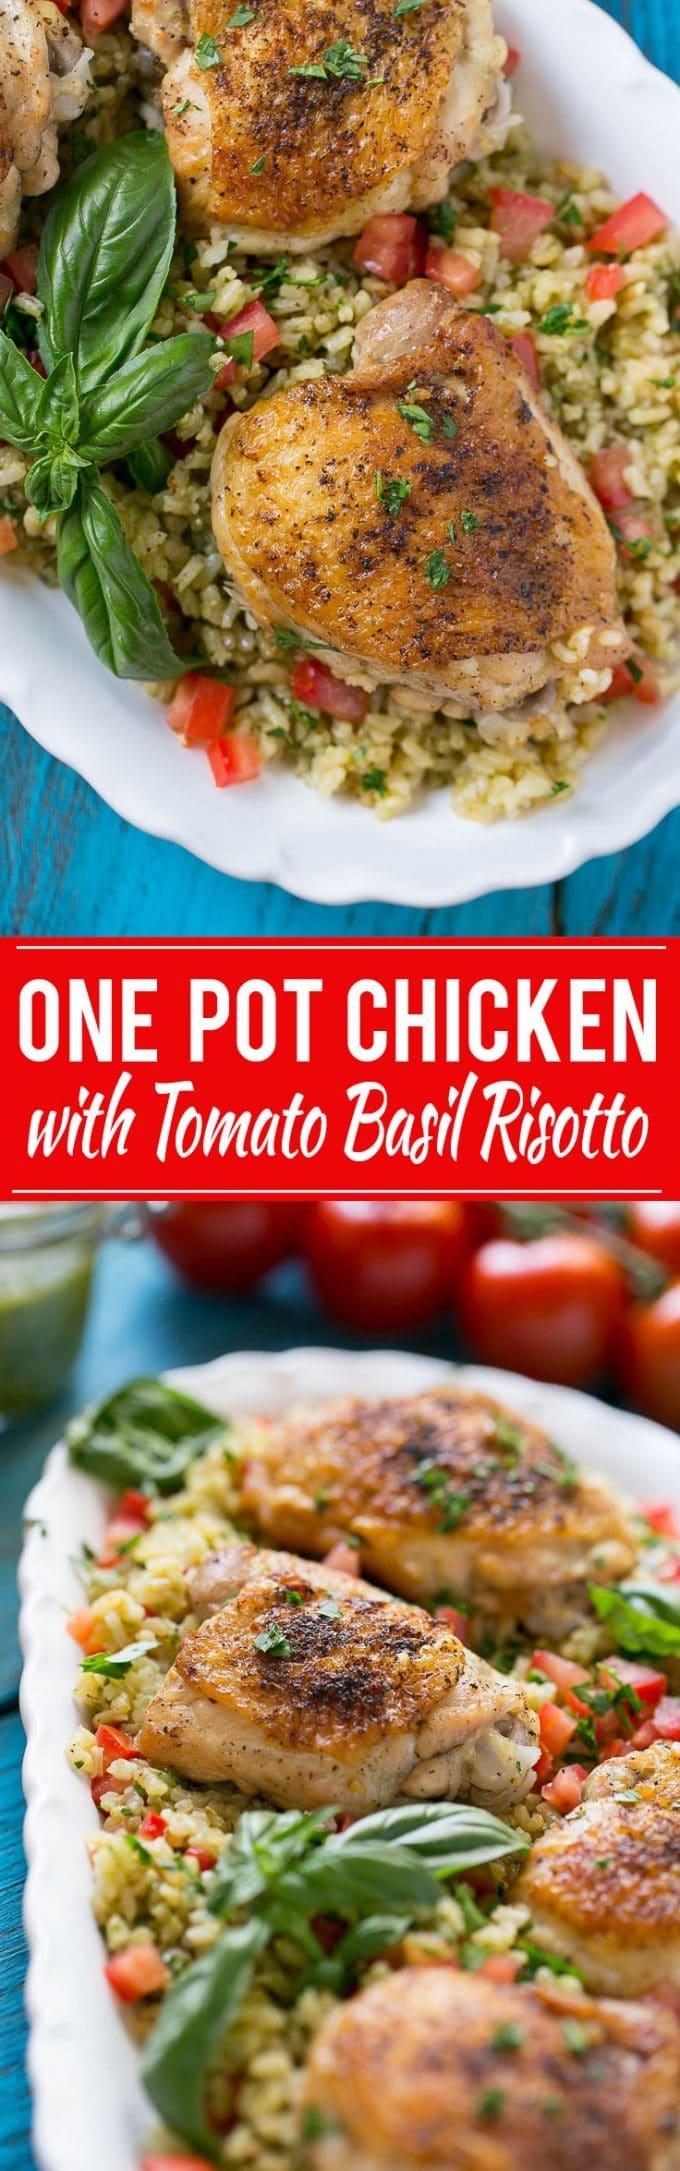 One Pot Chicken with Tomato Basil Risotto Recipe | One Pot Chicken and Risotto | Tomato Risotto | One Pot Chicken Risotto